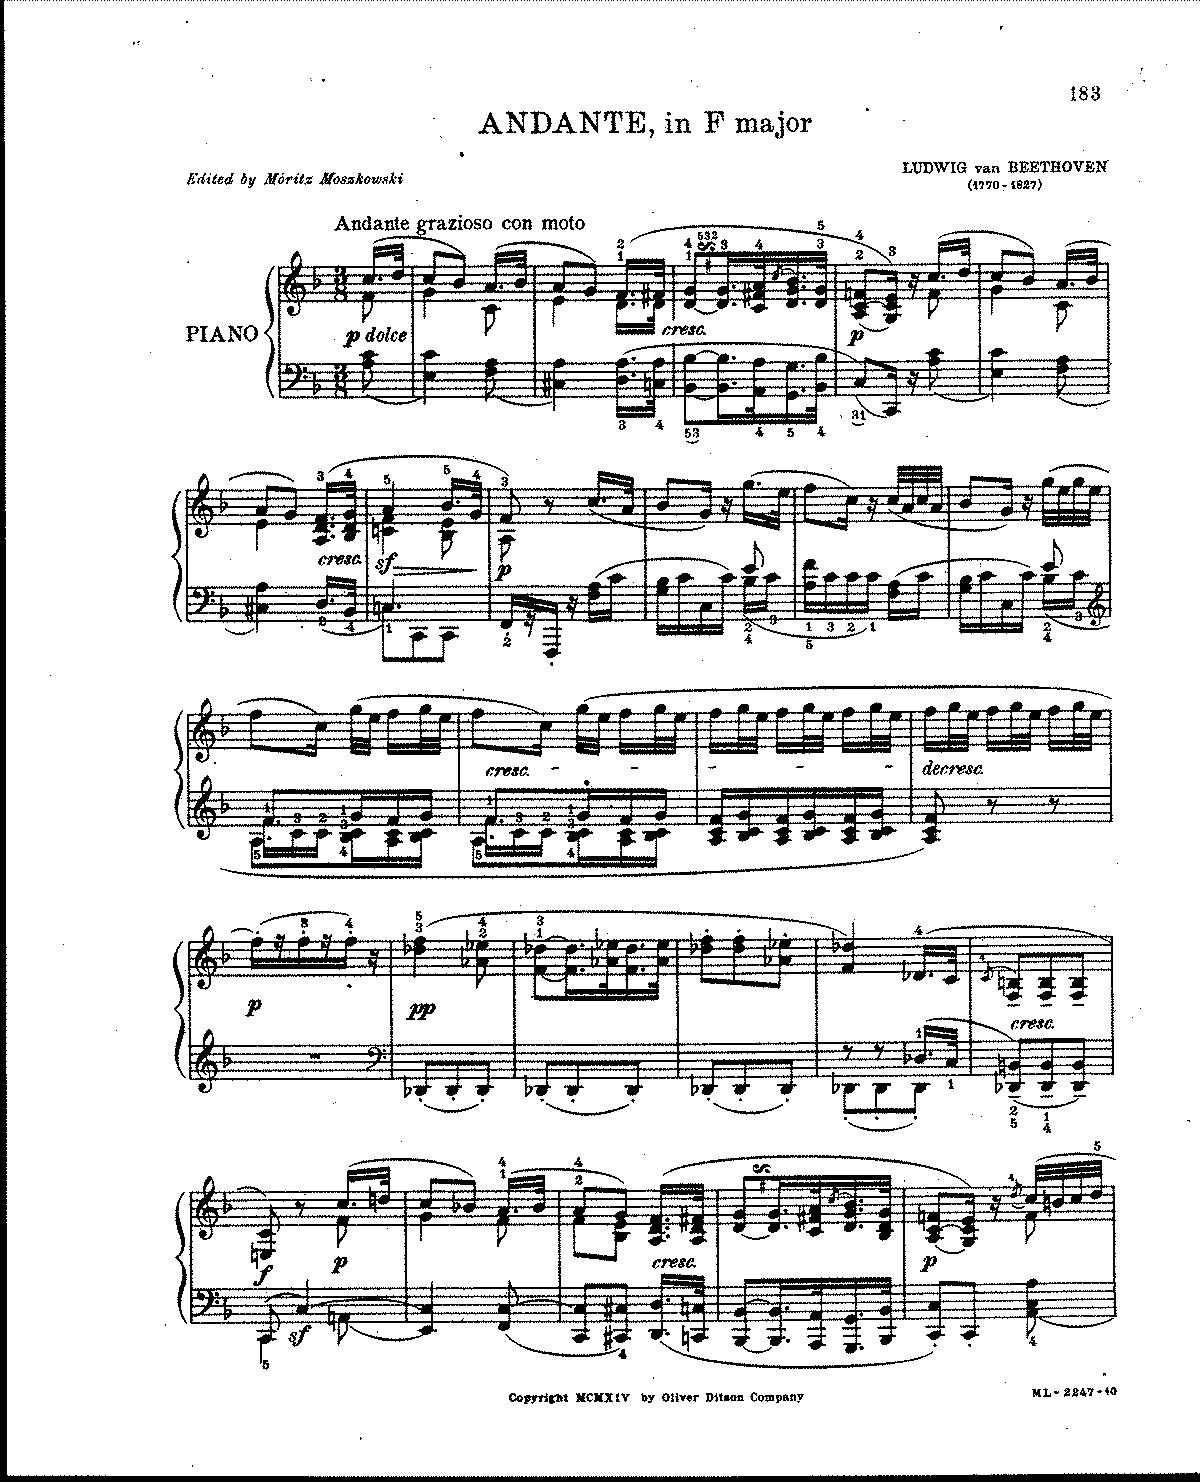 Free Sheet Music Public Domain: Andante Favori, WoO 57 (Beethoven, Ludwig Van)